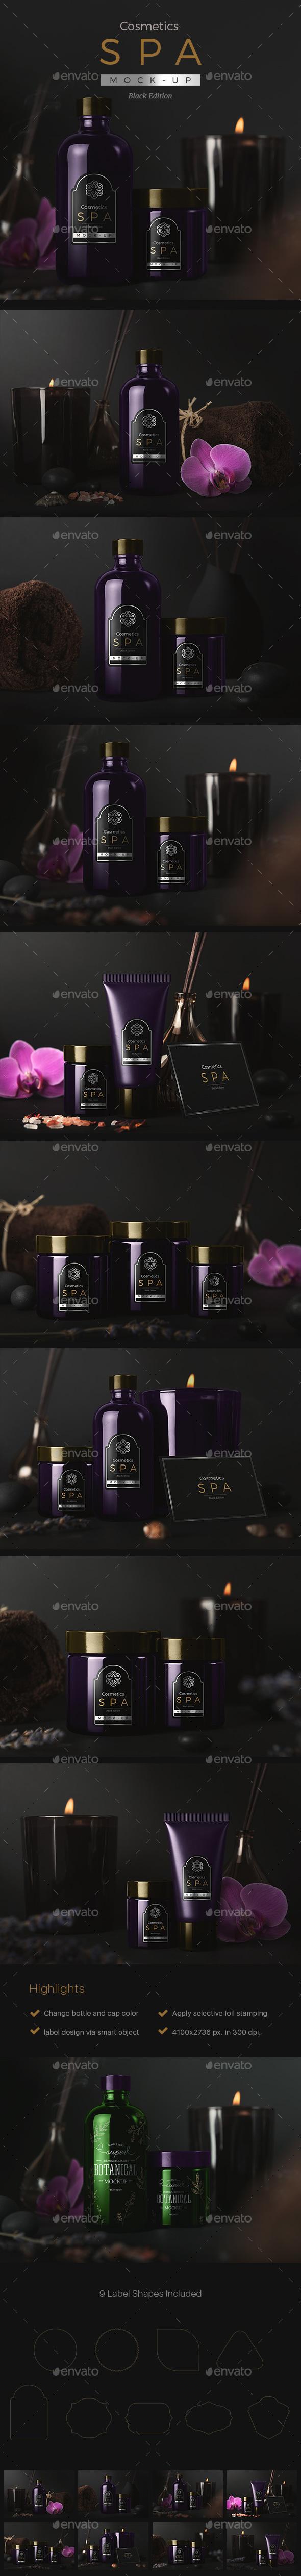 SPA Cosmetics Mock-Up V.2 - Beauty Packaging